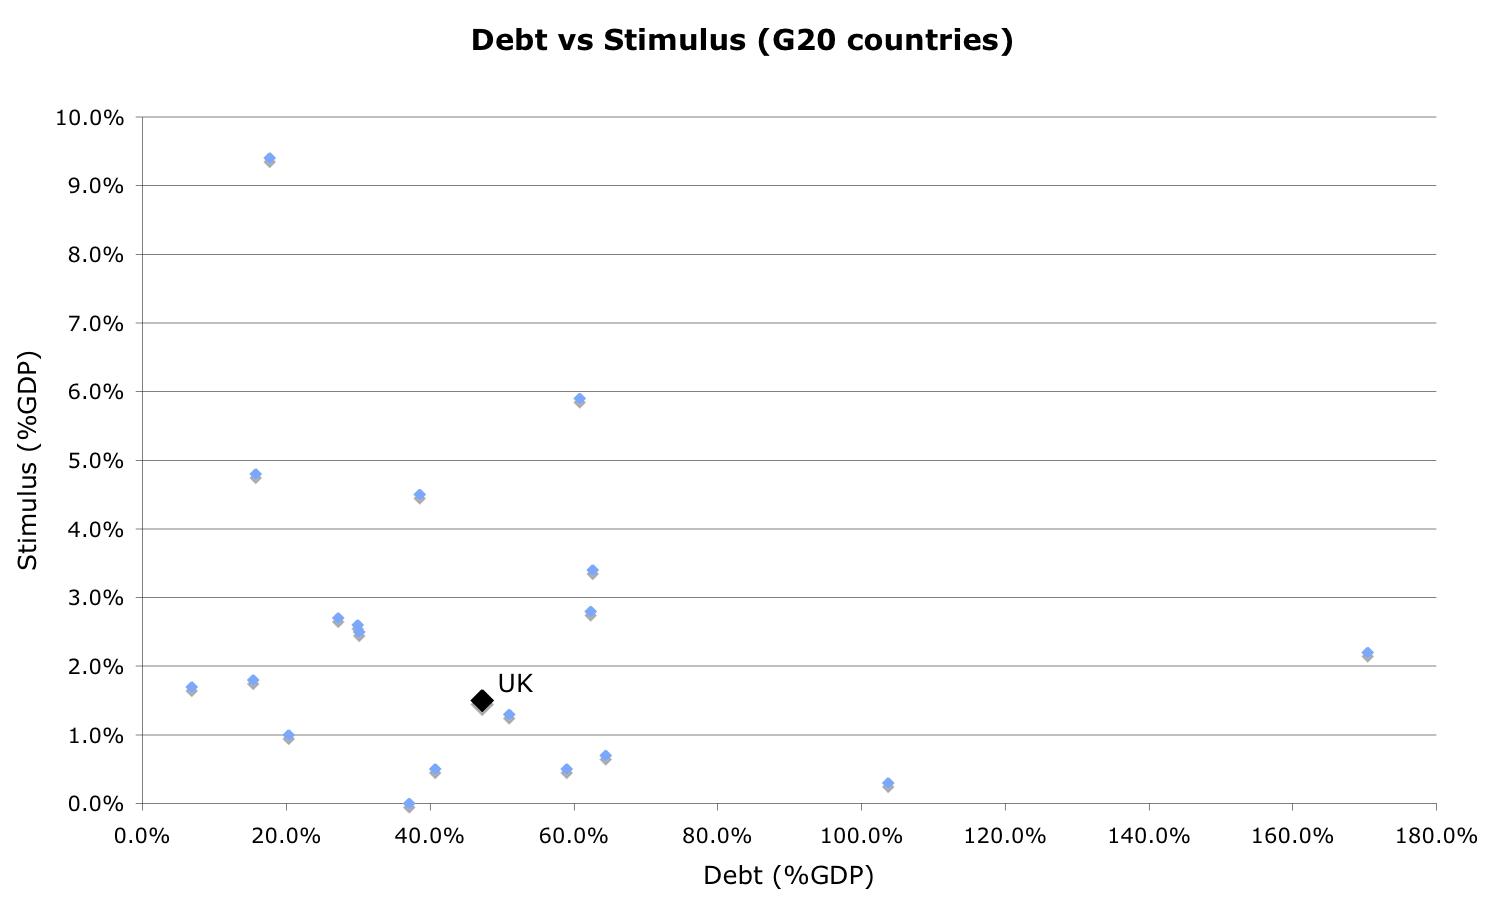 debt-stimulus-g20-countries